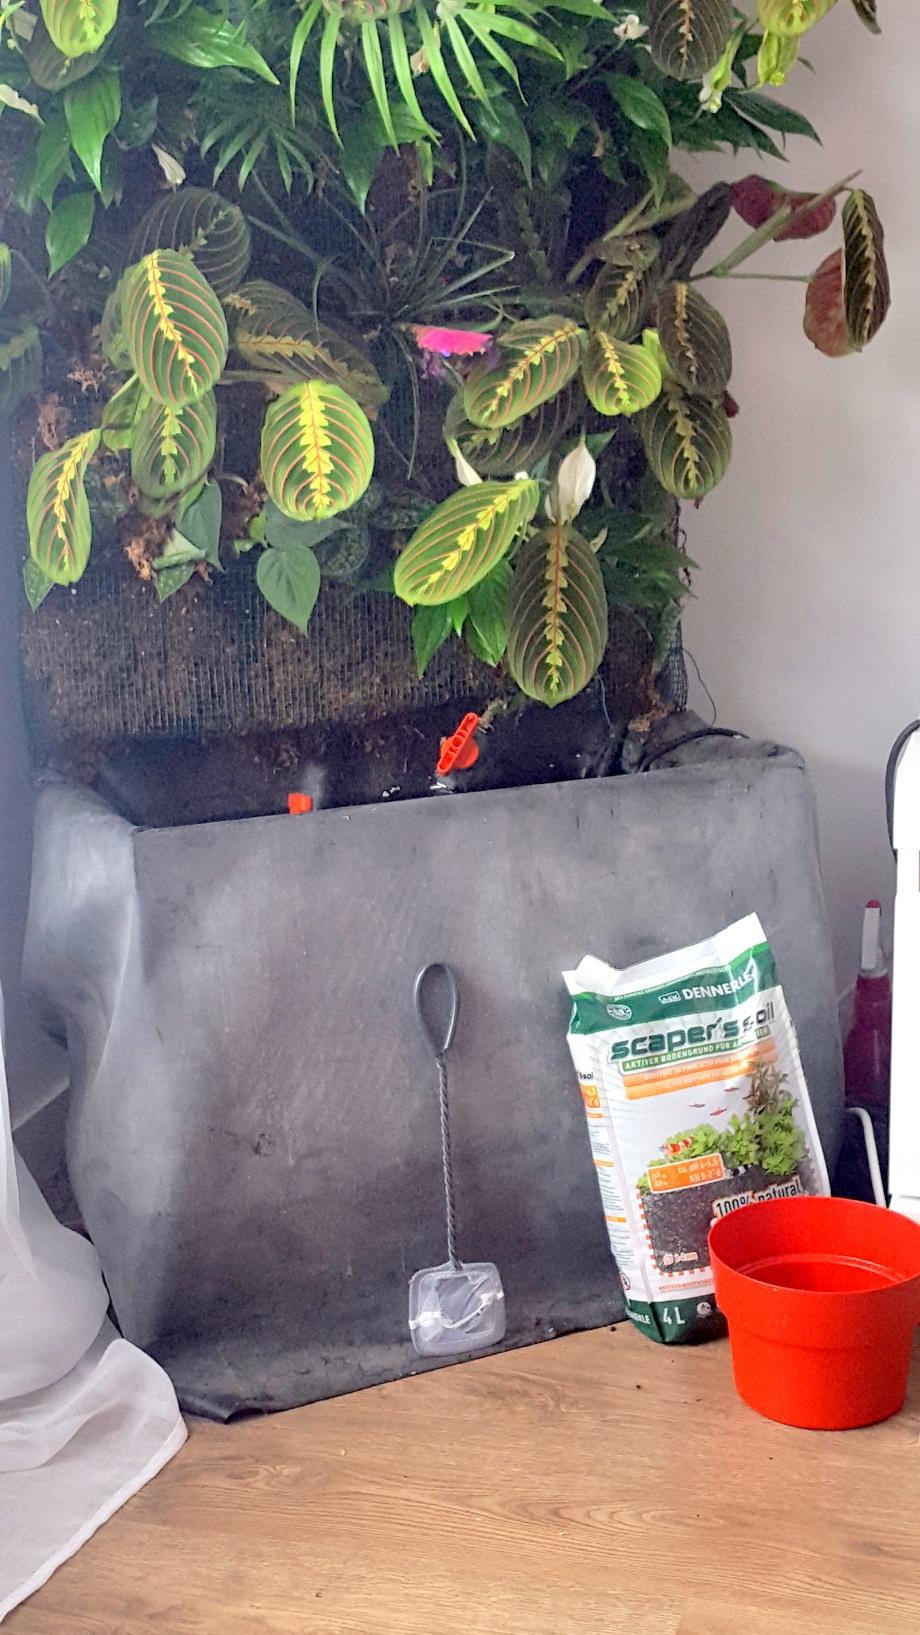 préparation plants bac 28 mars 17.jpg